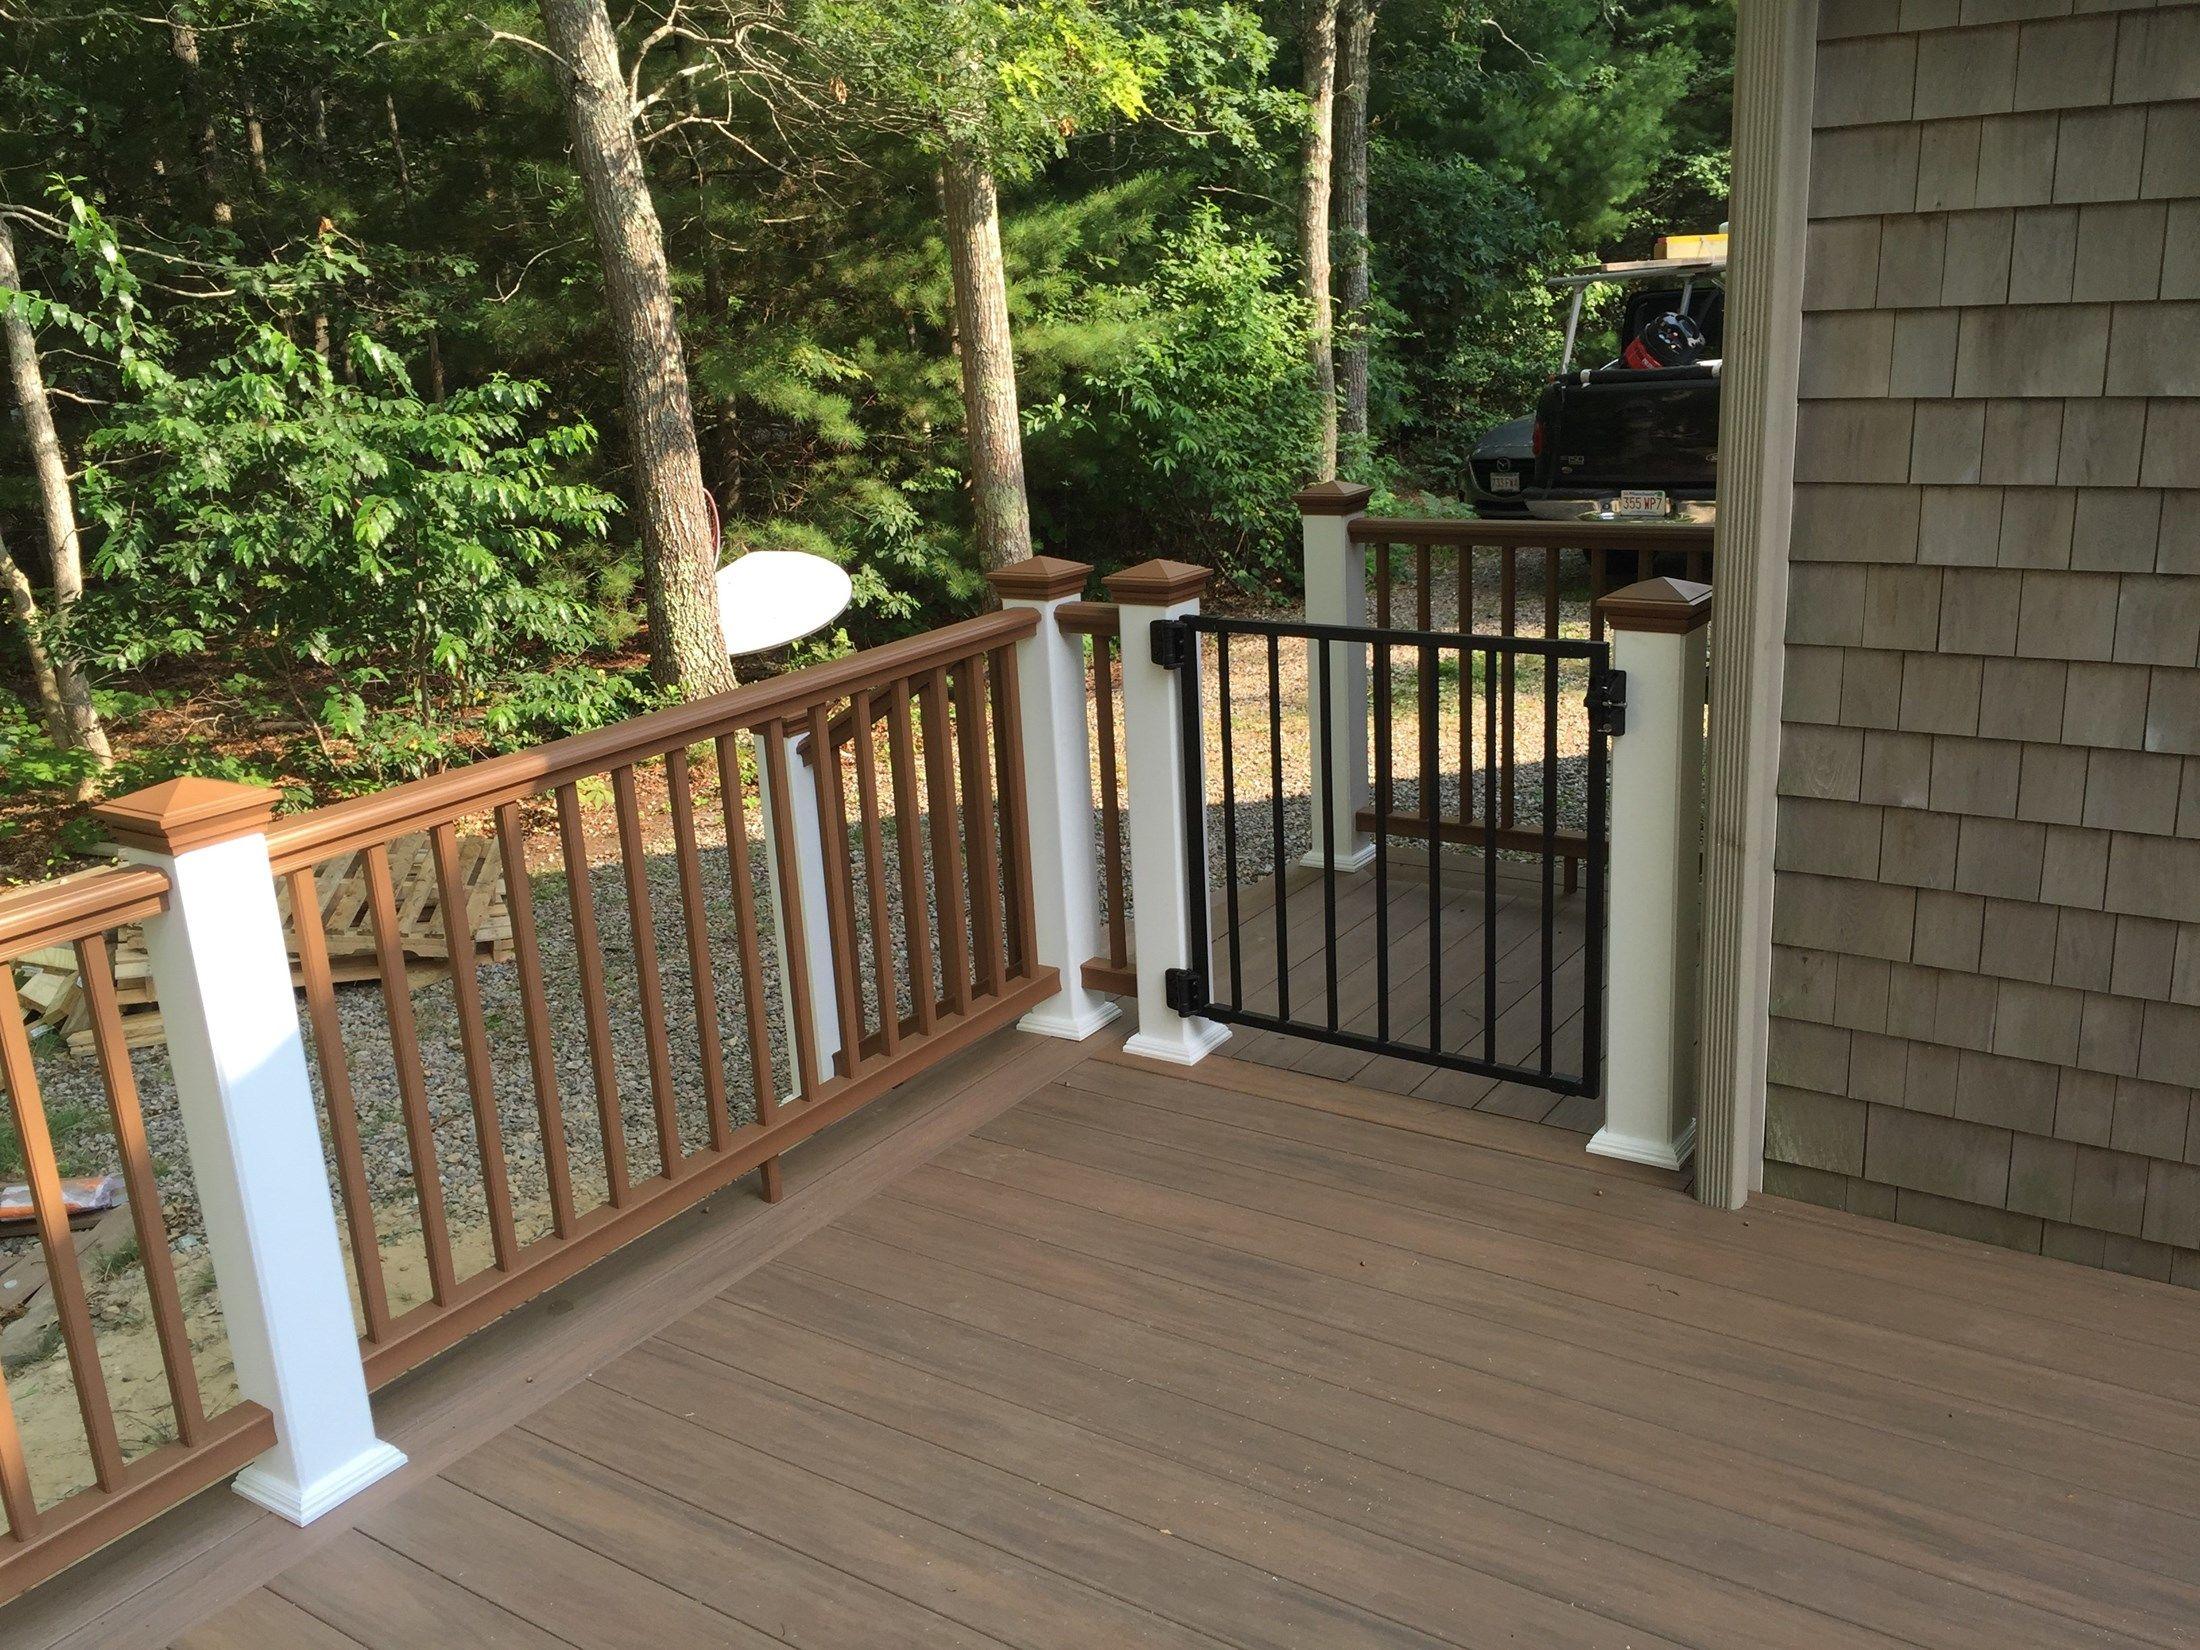 Cape Cod Classic Deck - Picture 6231